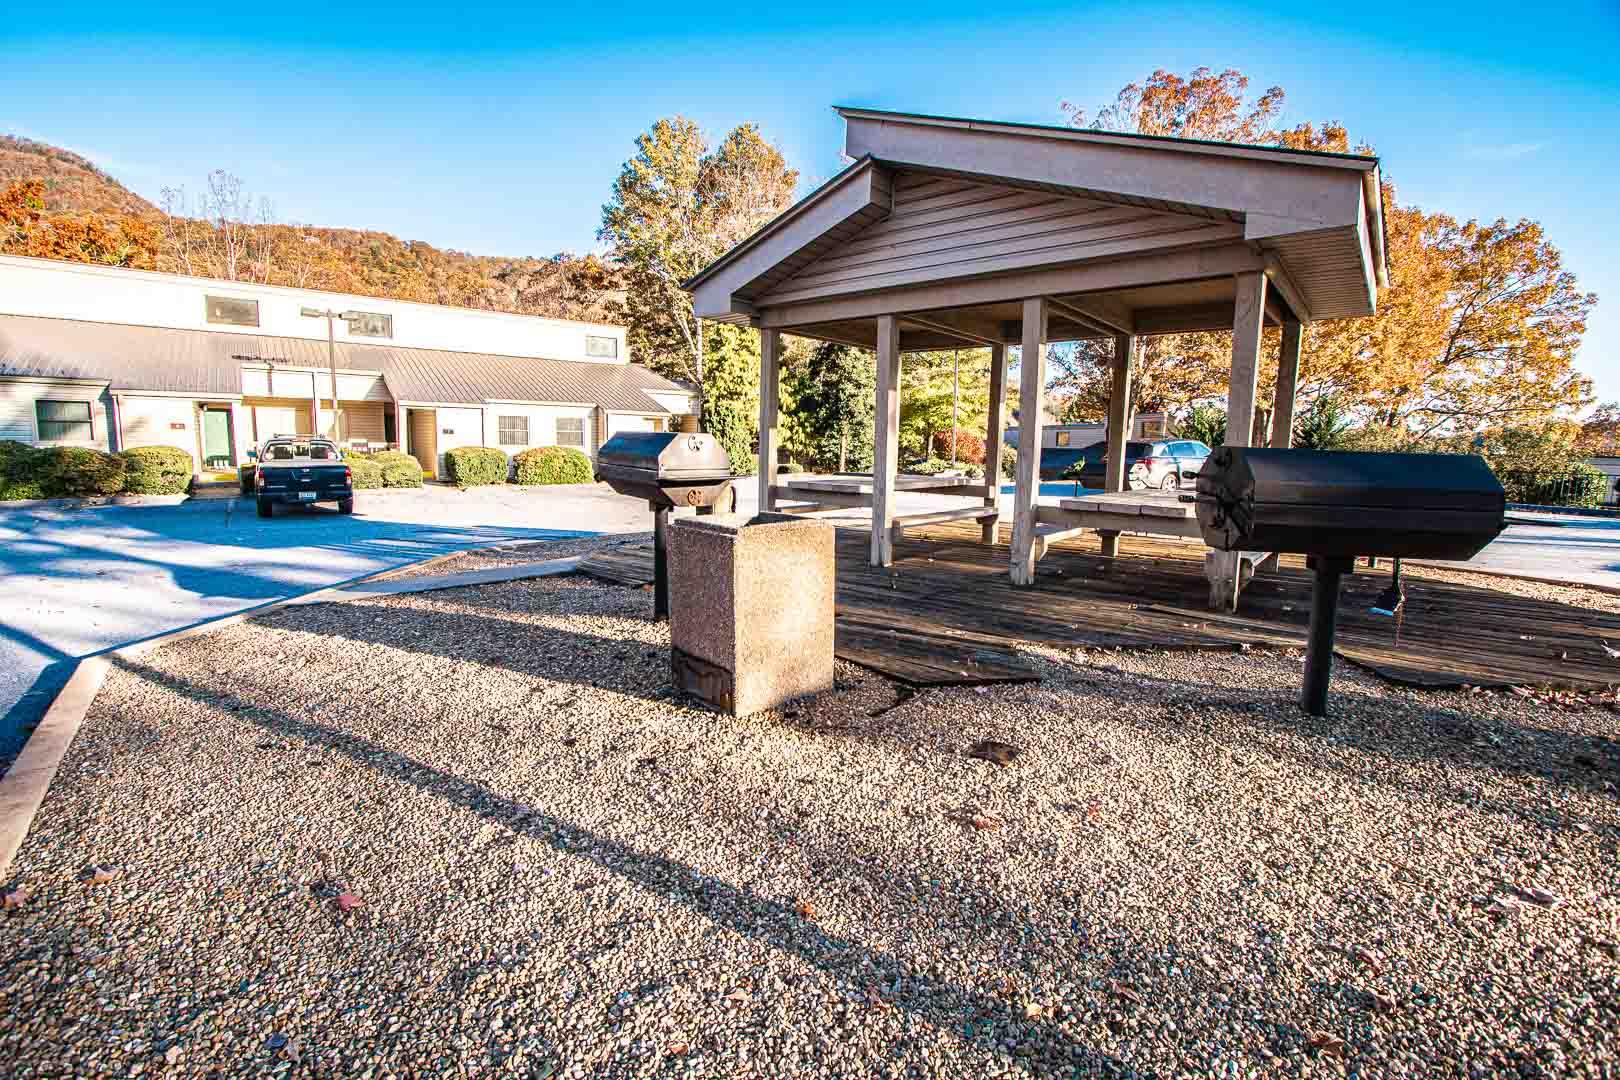 BBQ grills available at VRI's Mountain Loft Resort in North Carolina.